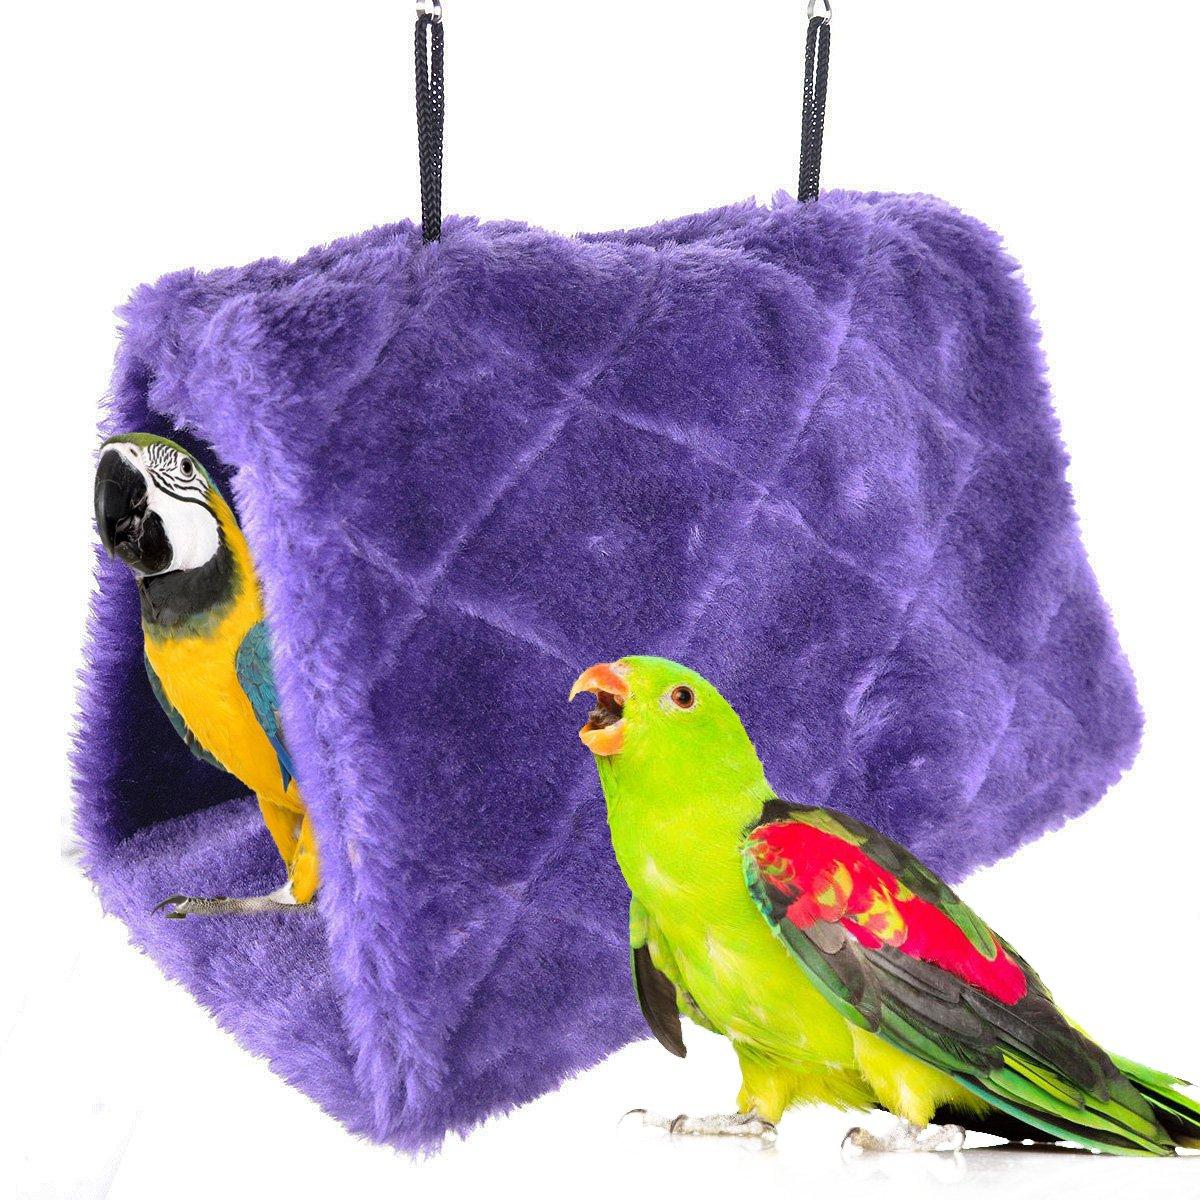 Winter Warm Bird Nest House Shed Hut Hanging Hammock Finch Cage Plush Fluffy Birds Hut Hideaway for Hamster Parrot Macaw Budgies Eclectus Parakeet Cockatiels Cockatoo Lovebird (M, Purple)